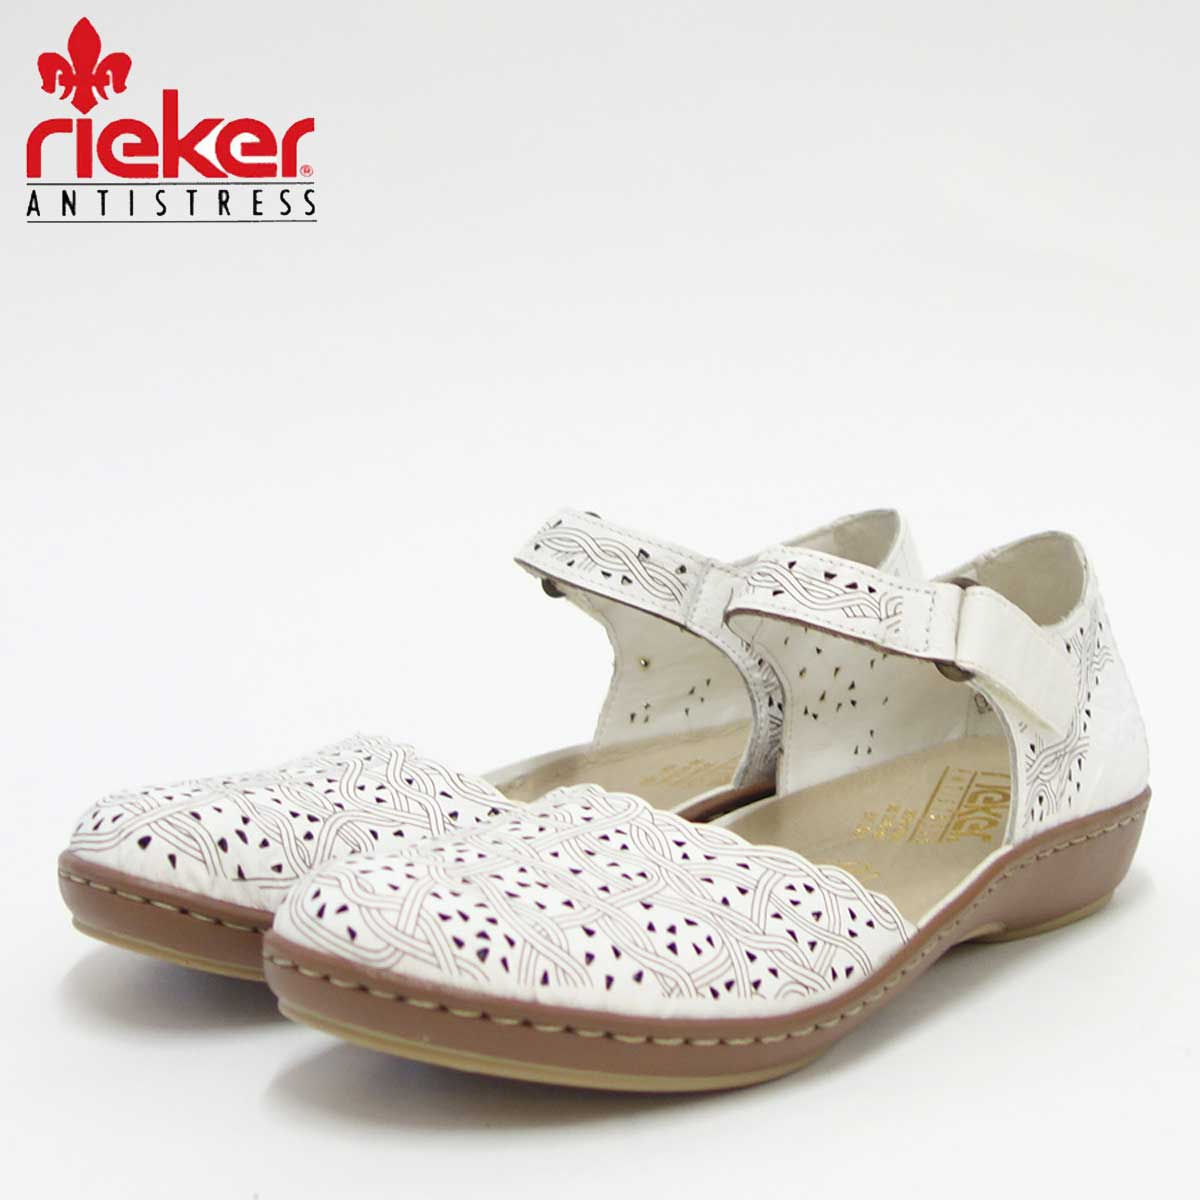 rieker リーカー 45887 80 ホワイト (レディース)クッション性の良いお洒落ストラップシューズ「靴」